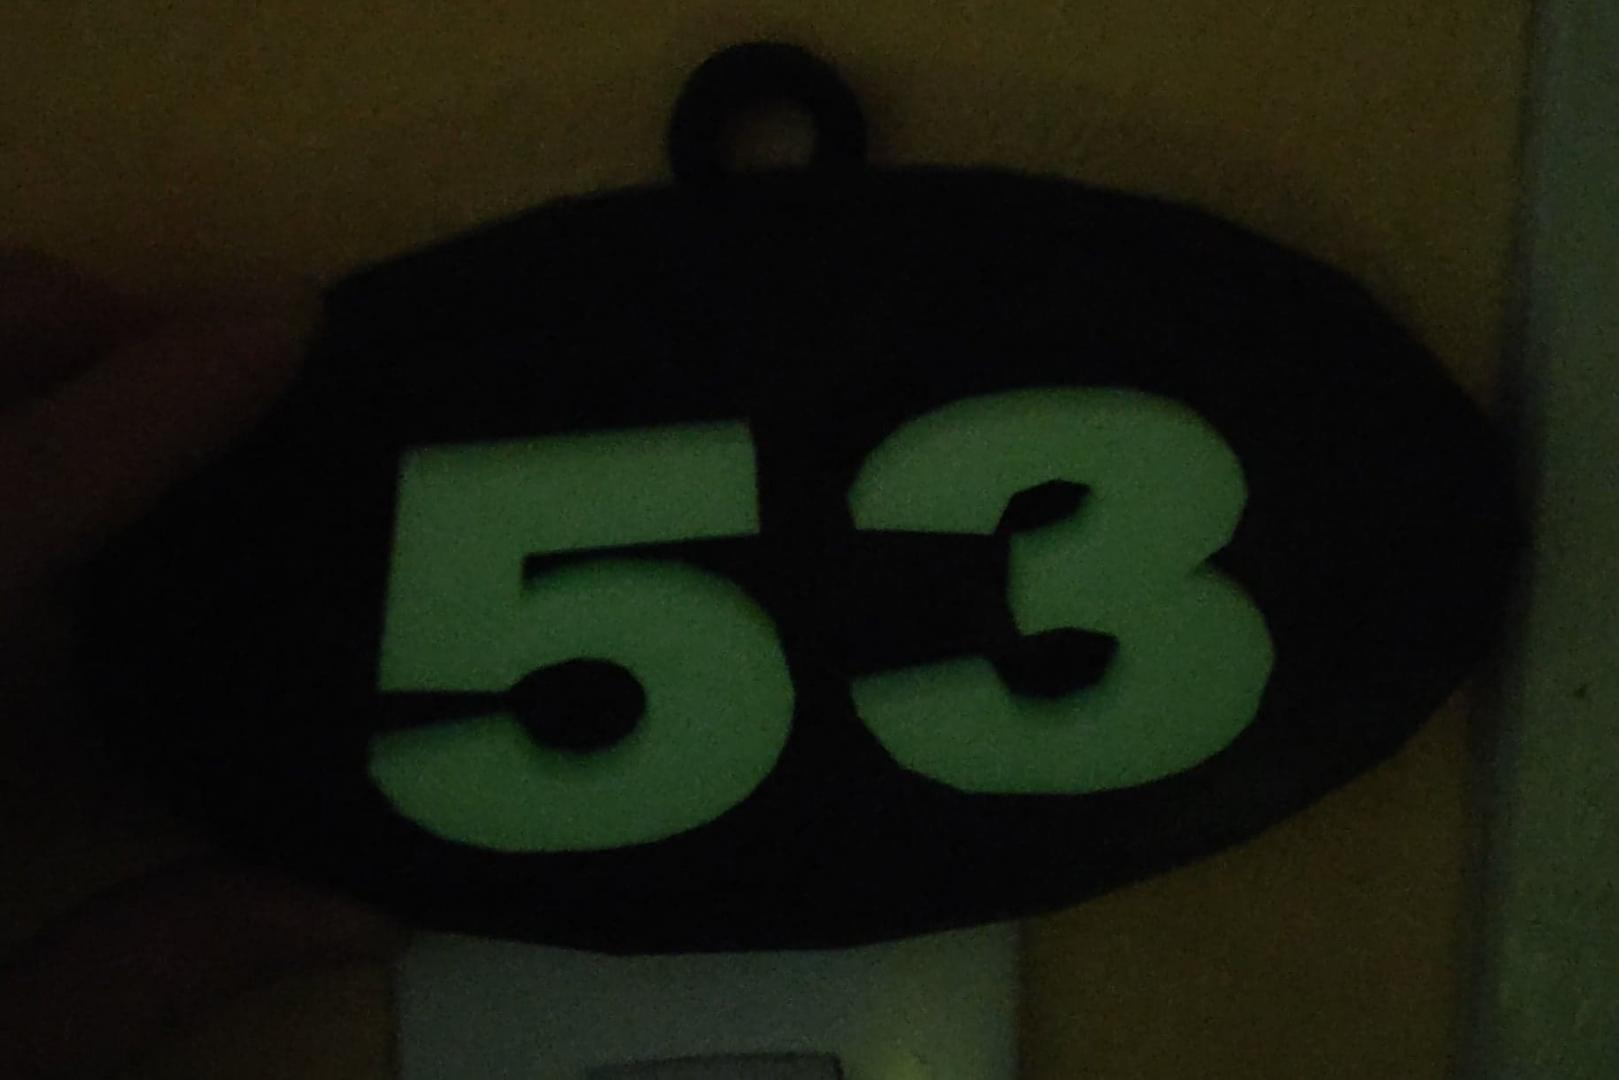 Numéro de rue phosphorescent